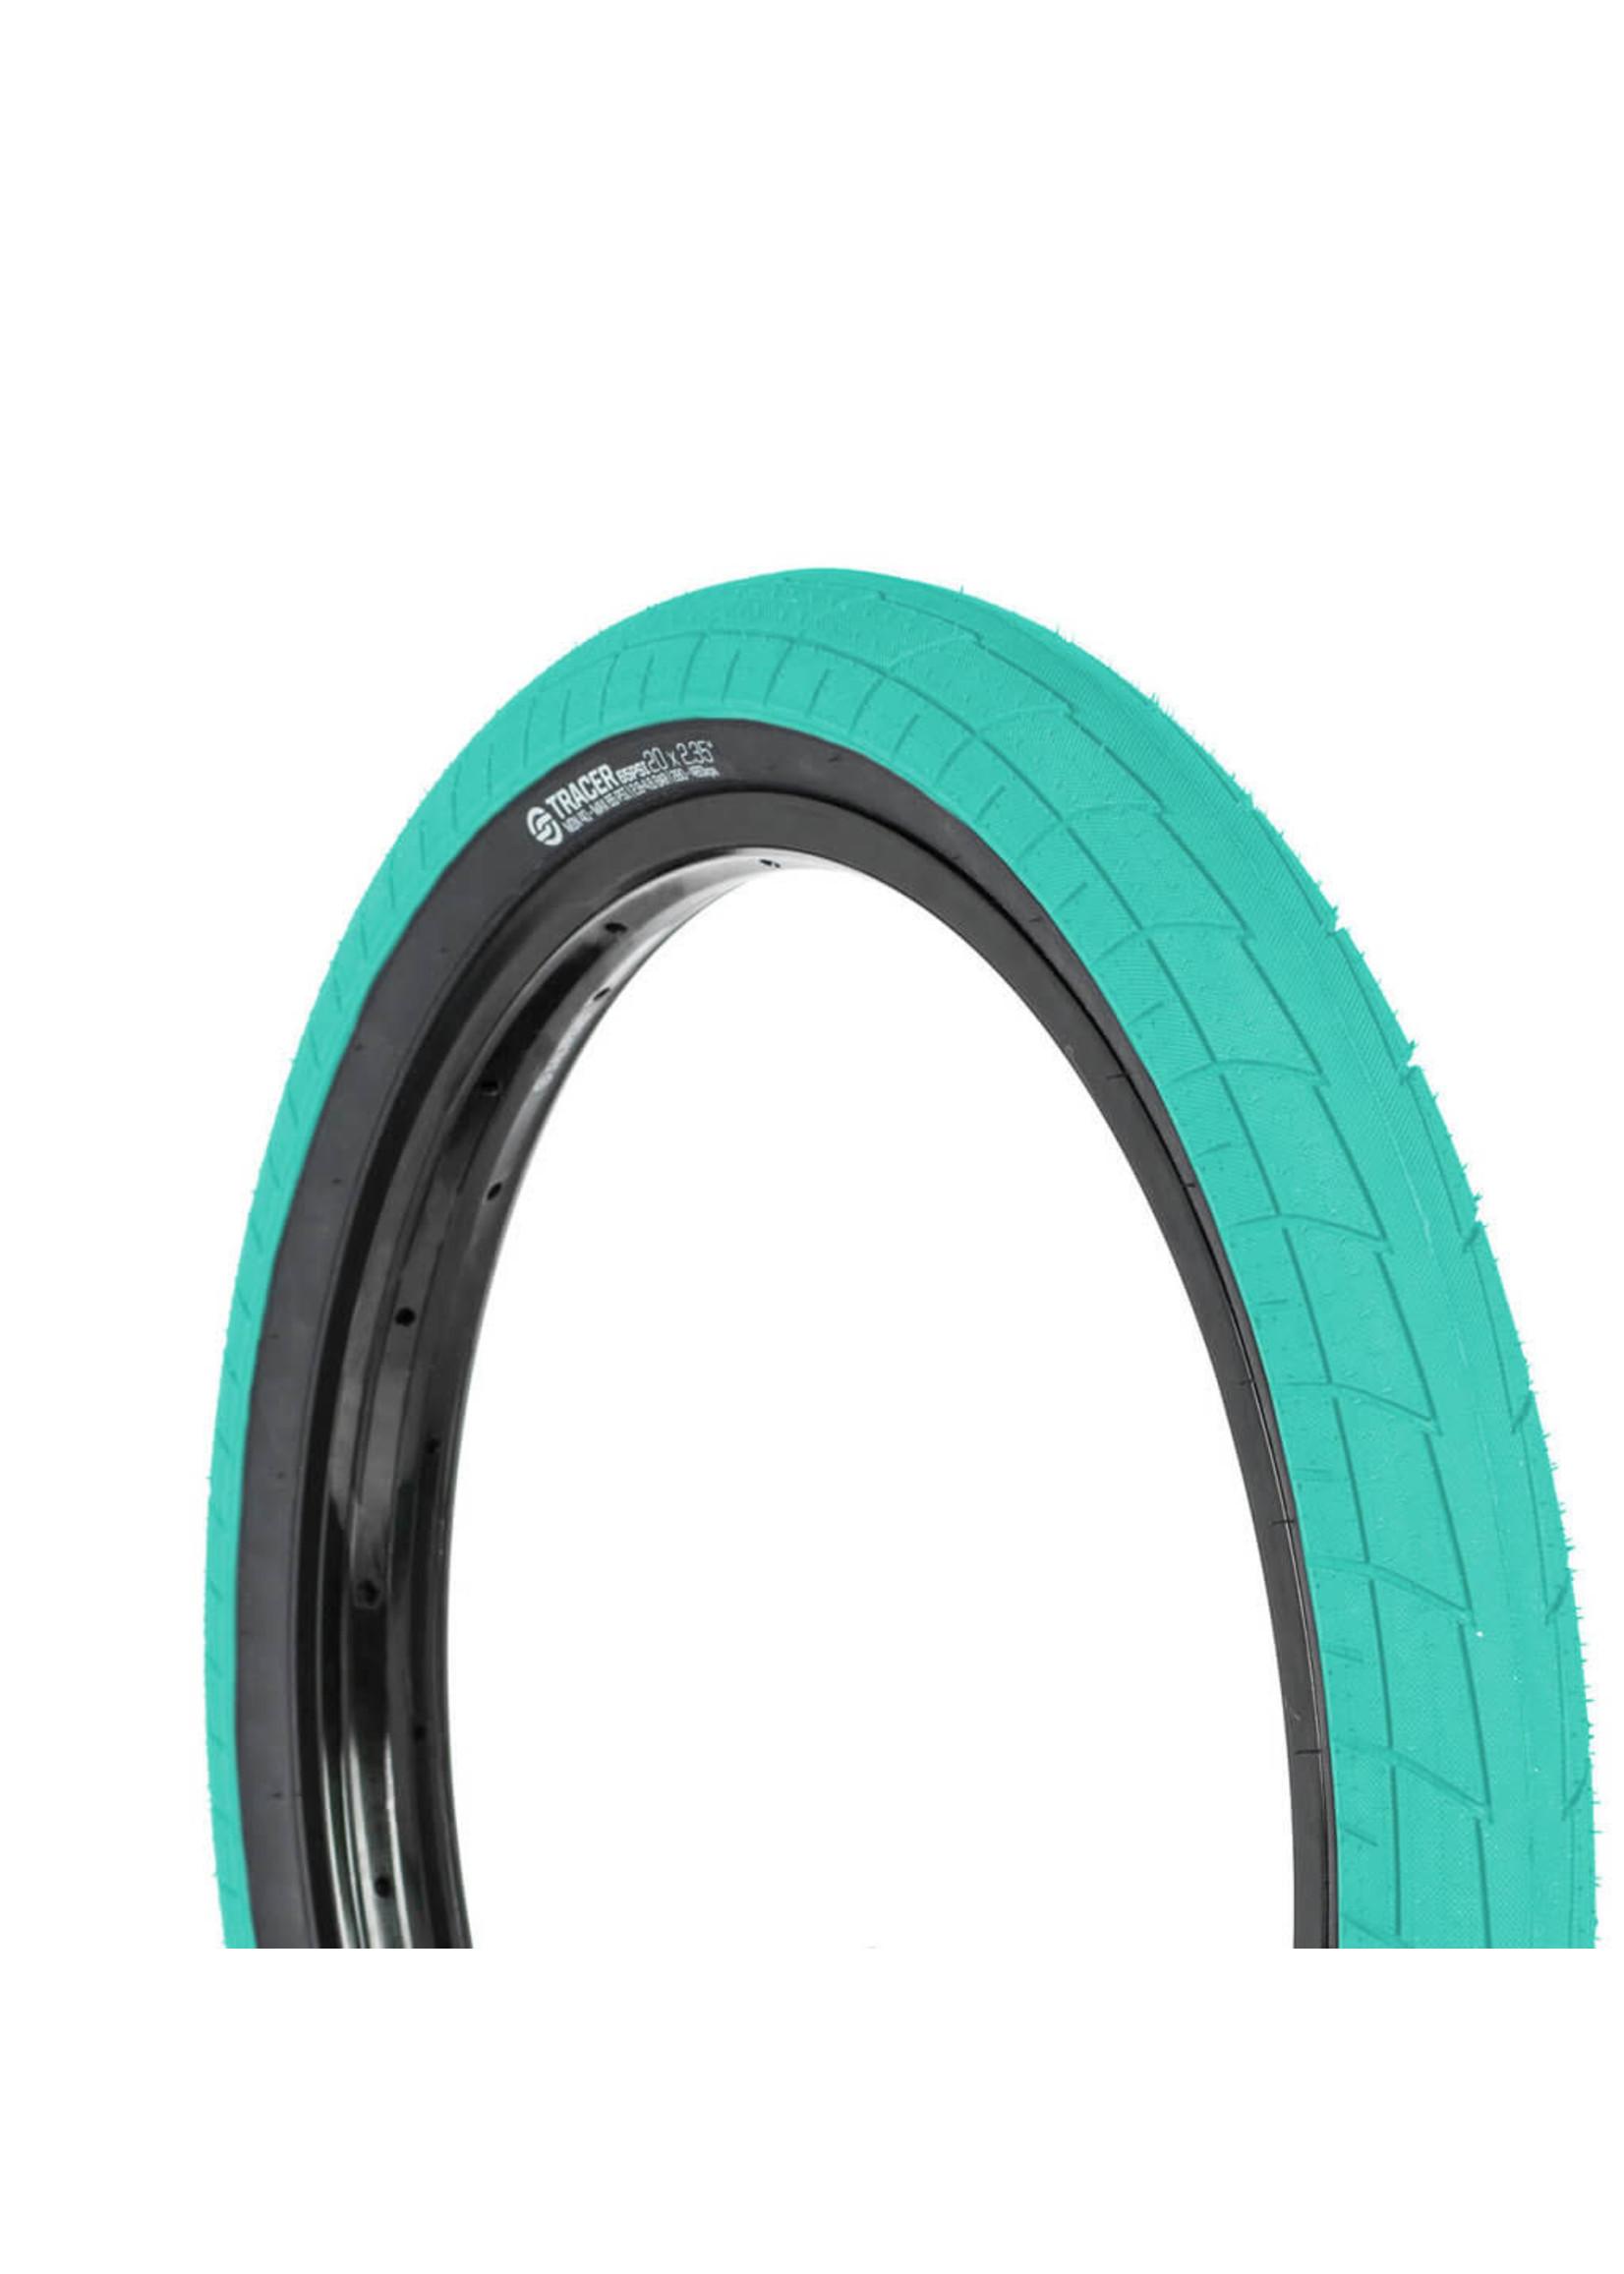 Salt Salt - Tracer Tire - 20 x 2.35